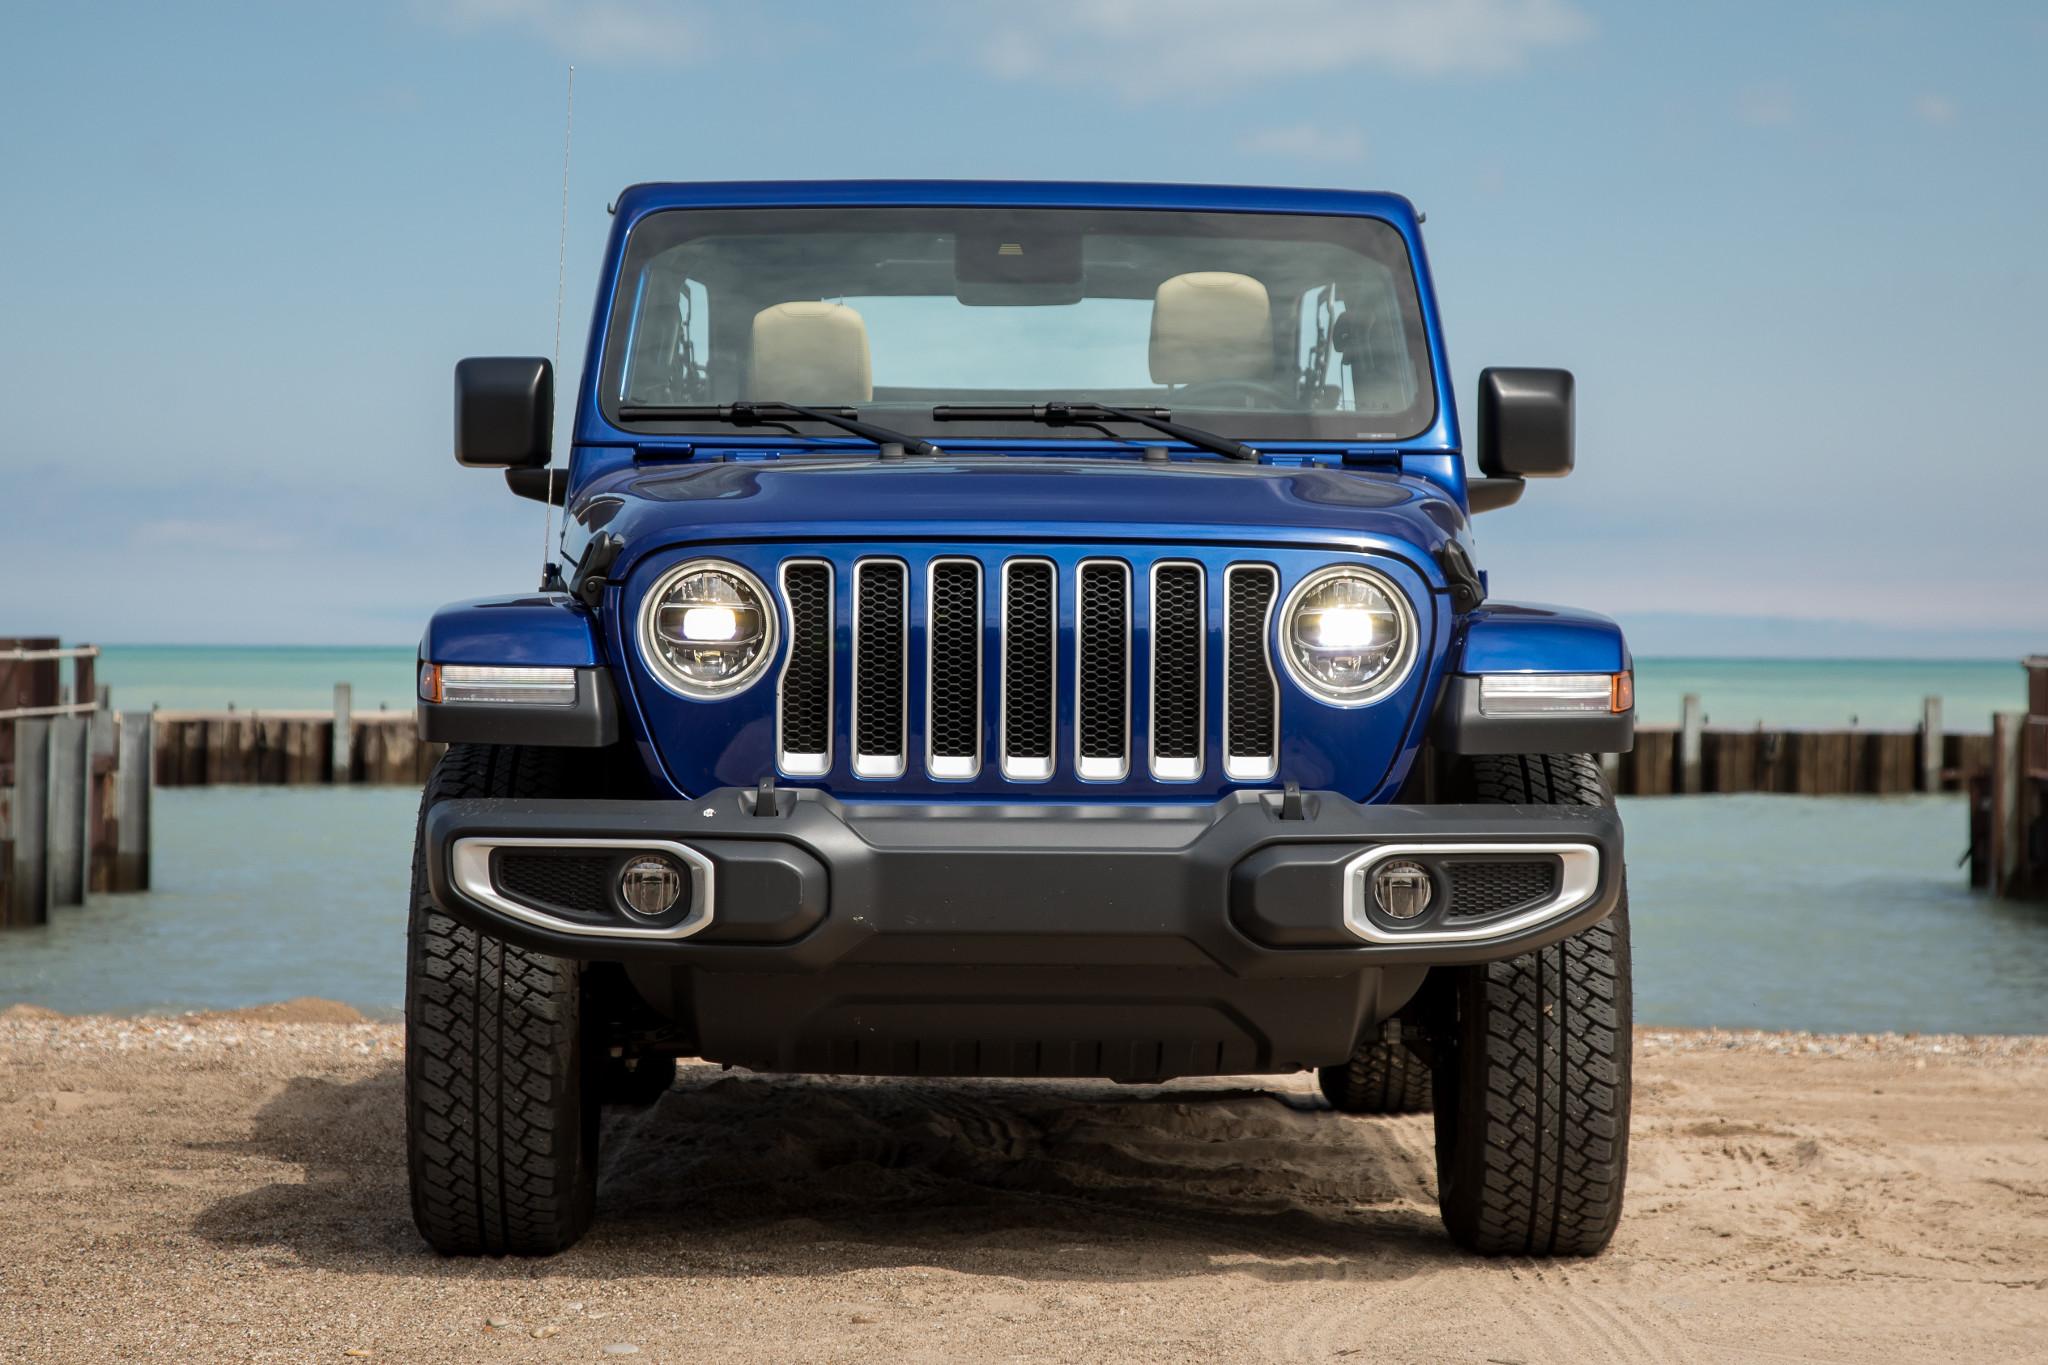 08-jeep-wrangler-2019-beach--blue--exterior--front.jpg